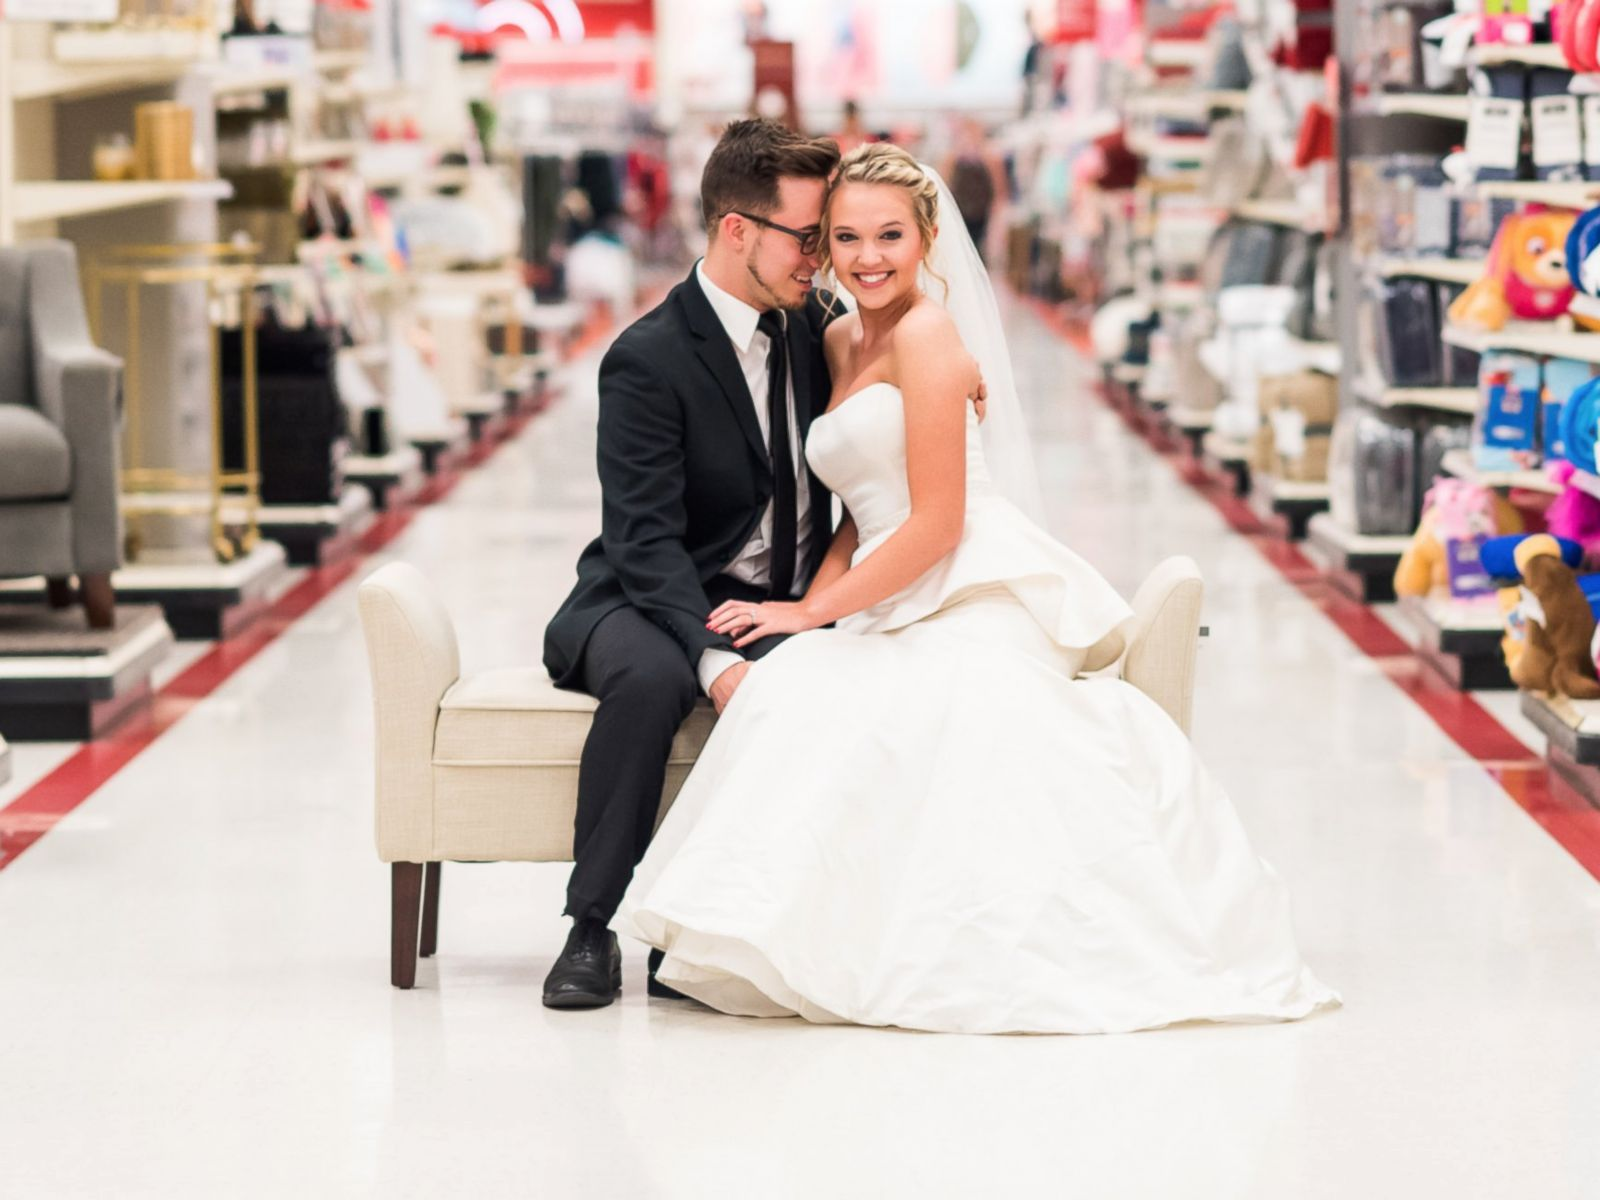 Target Wedding Dresses.West Virginia Couple Recreates Wedding Photos Inside Target To